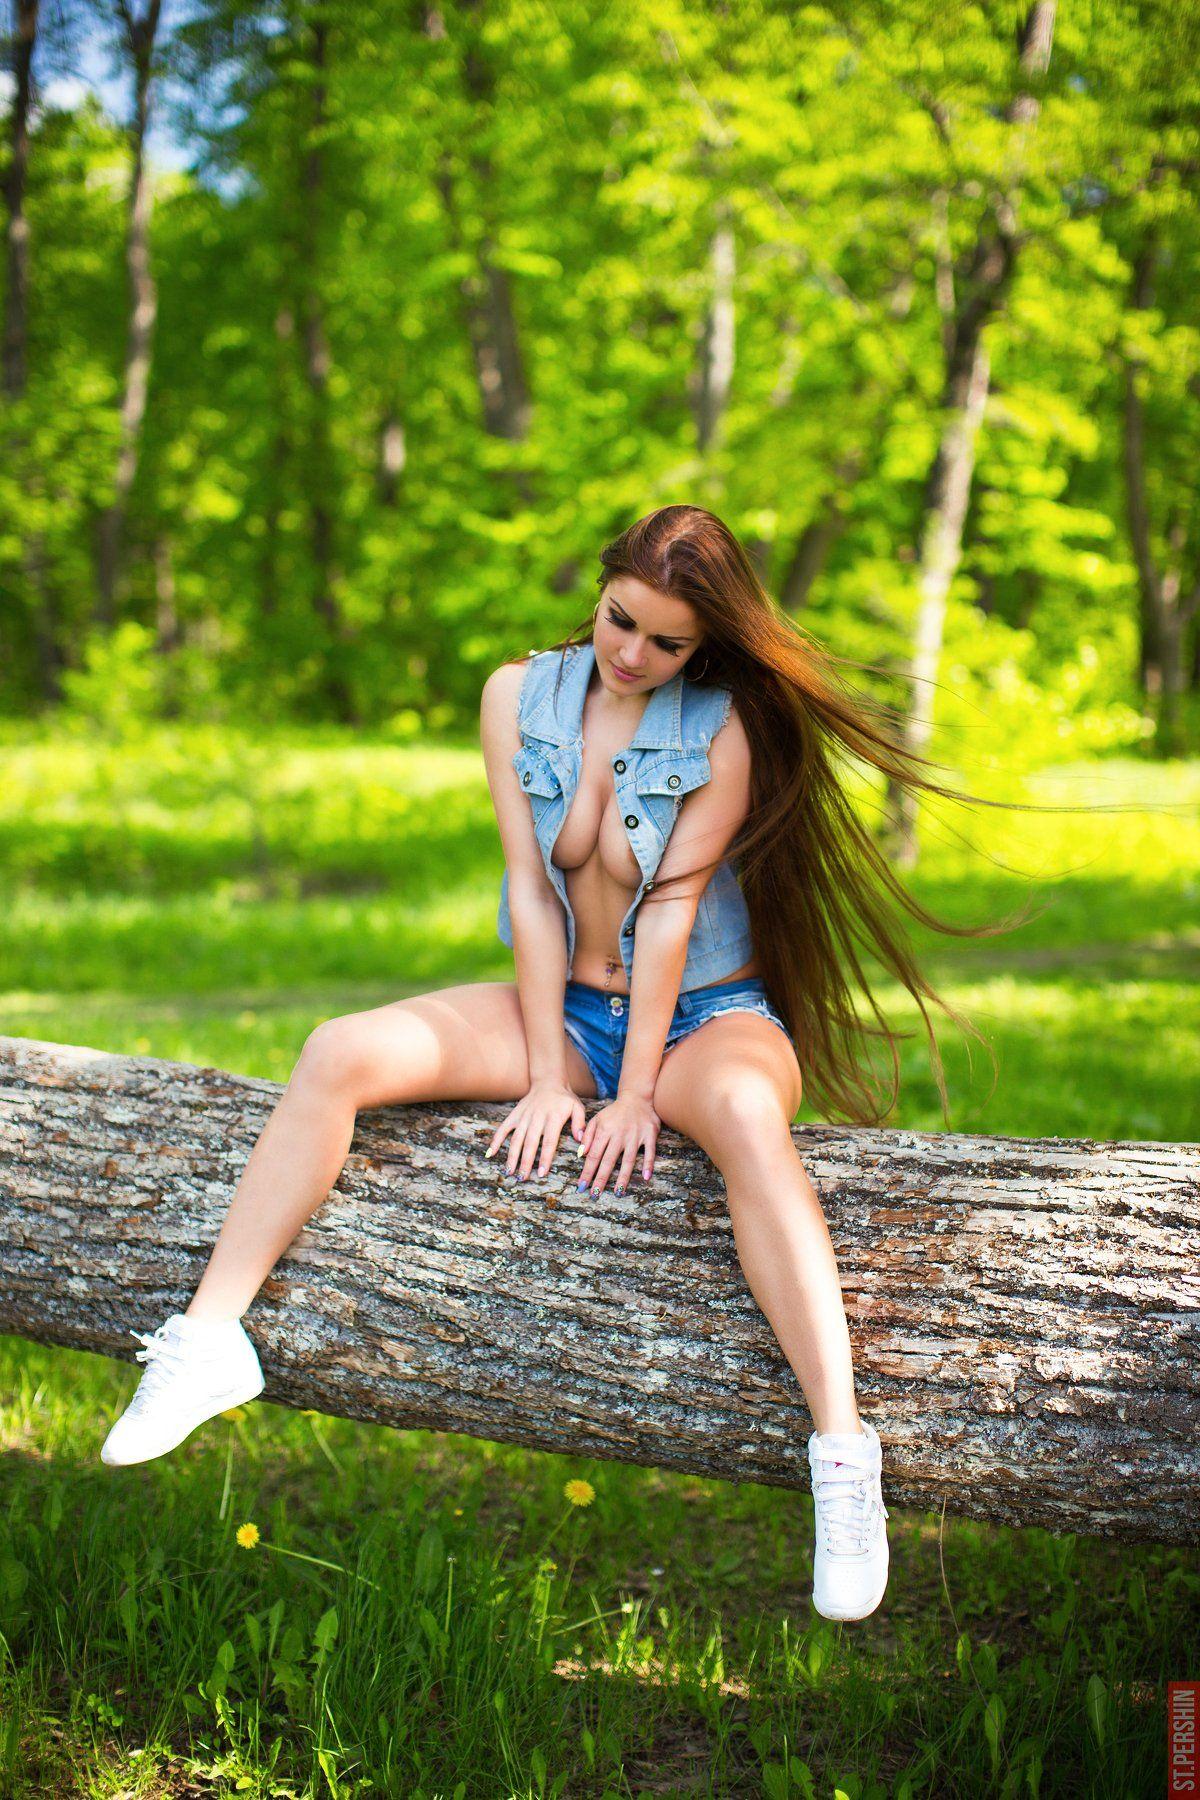 st.pershin, st_pershin, летнее ню, summer nude, фотограф ню, nude photography, St.Pershin